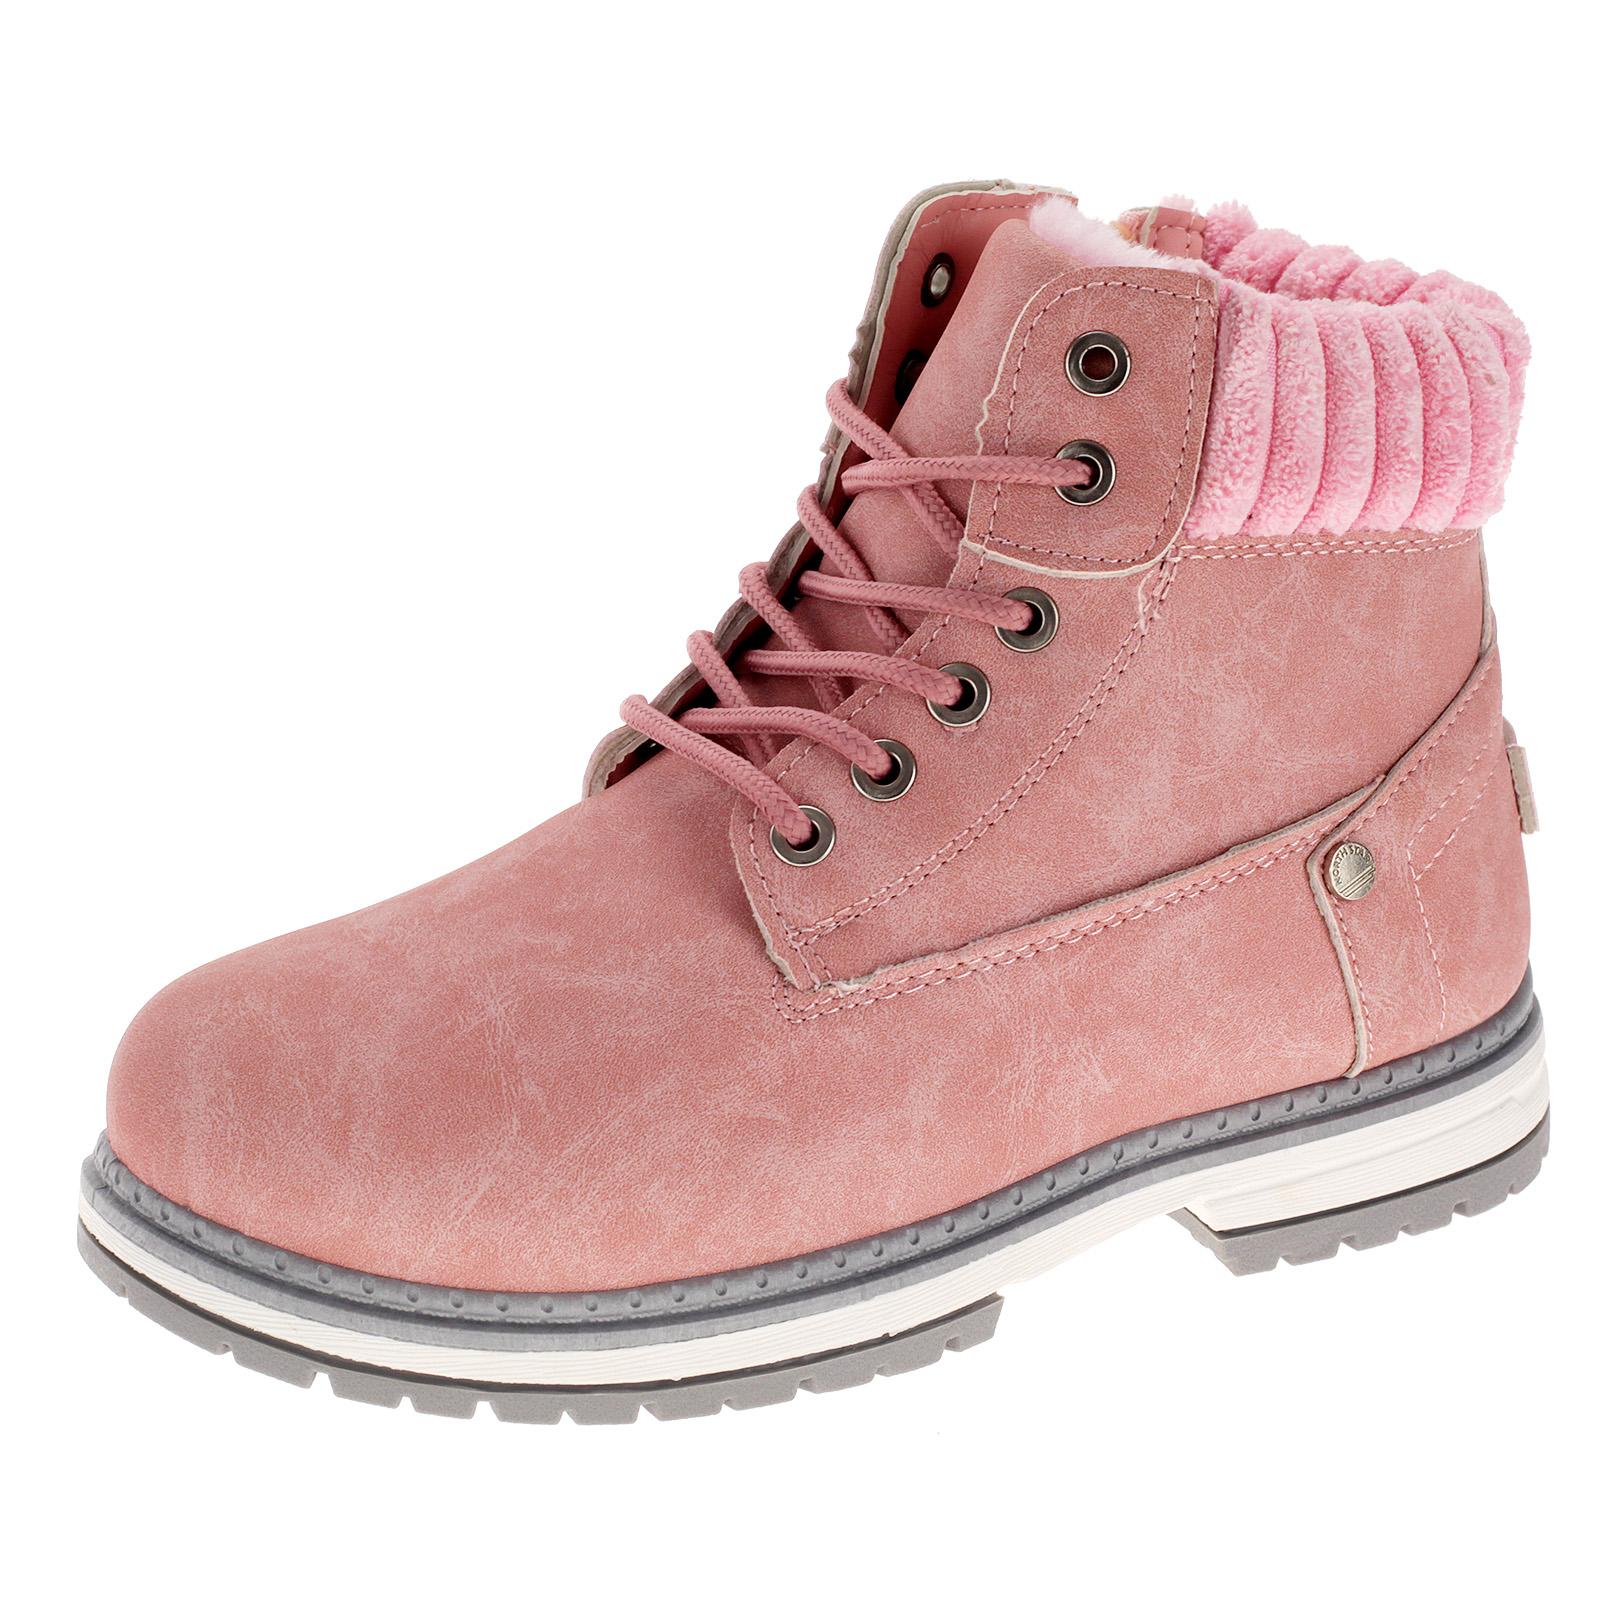 Damen Stiefeletten Gefütterte Winterschuhe Boots Stiefel Booty Schuhe Warmfutter LS02 LS10 LS12